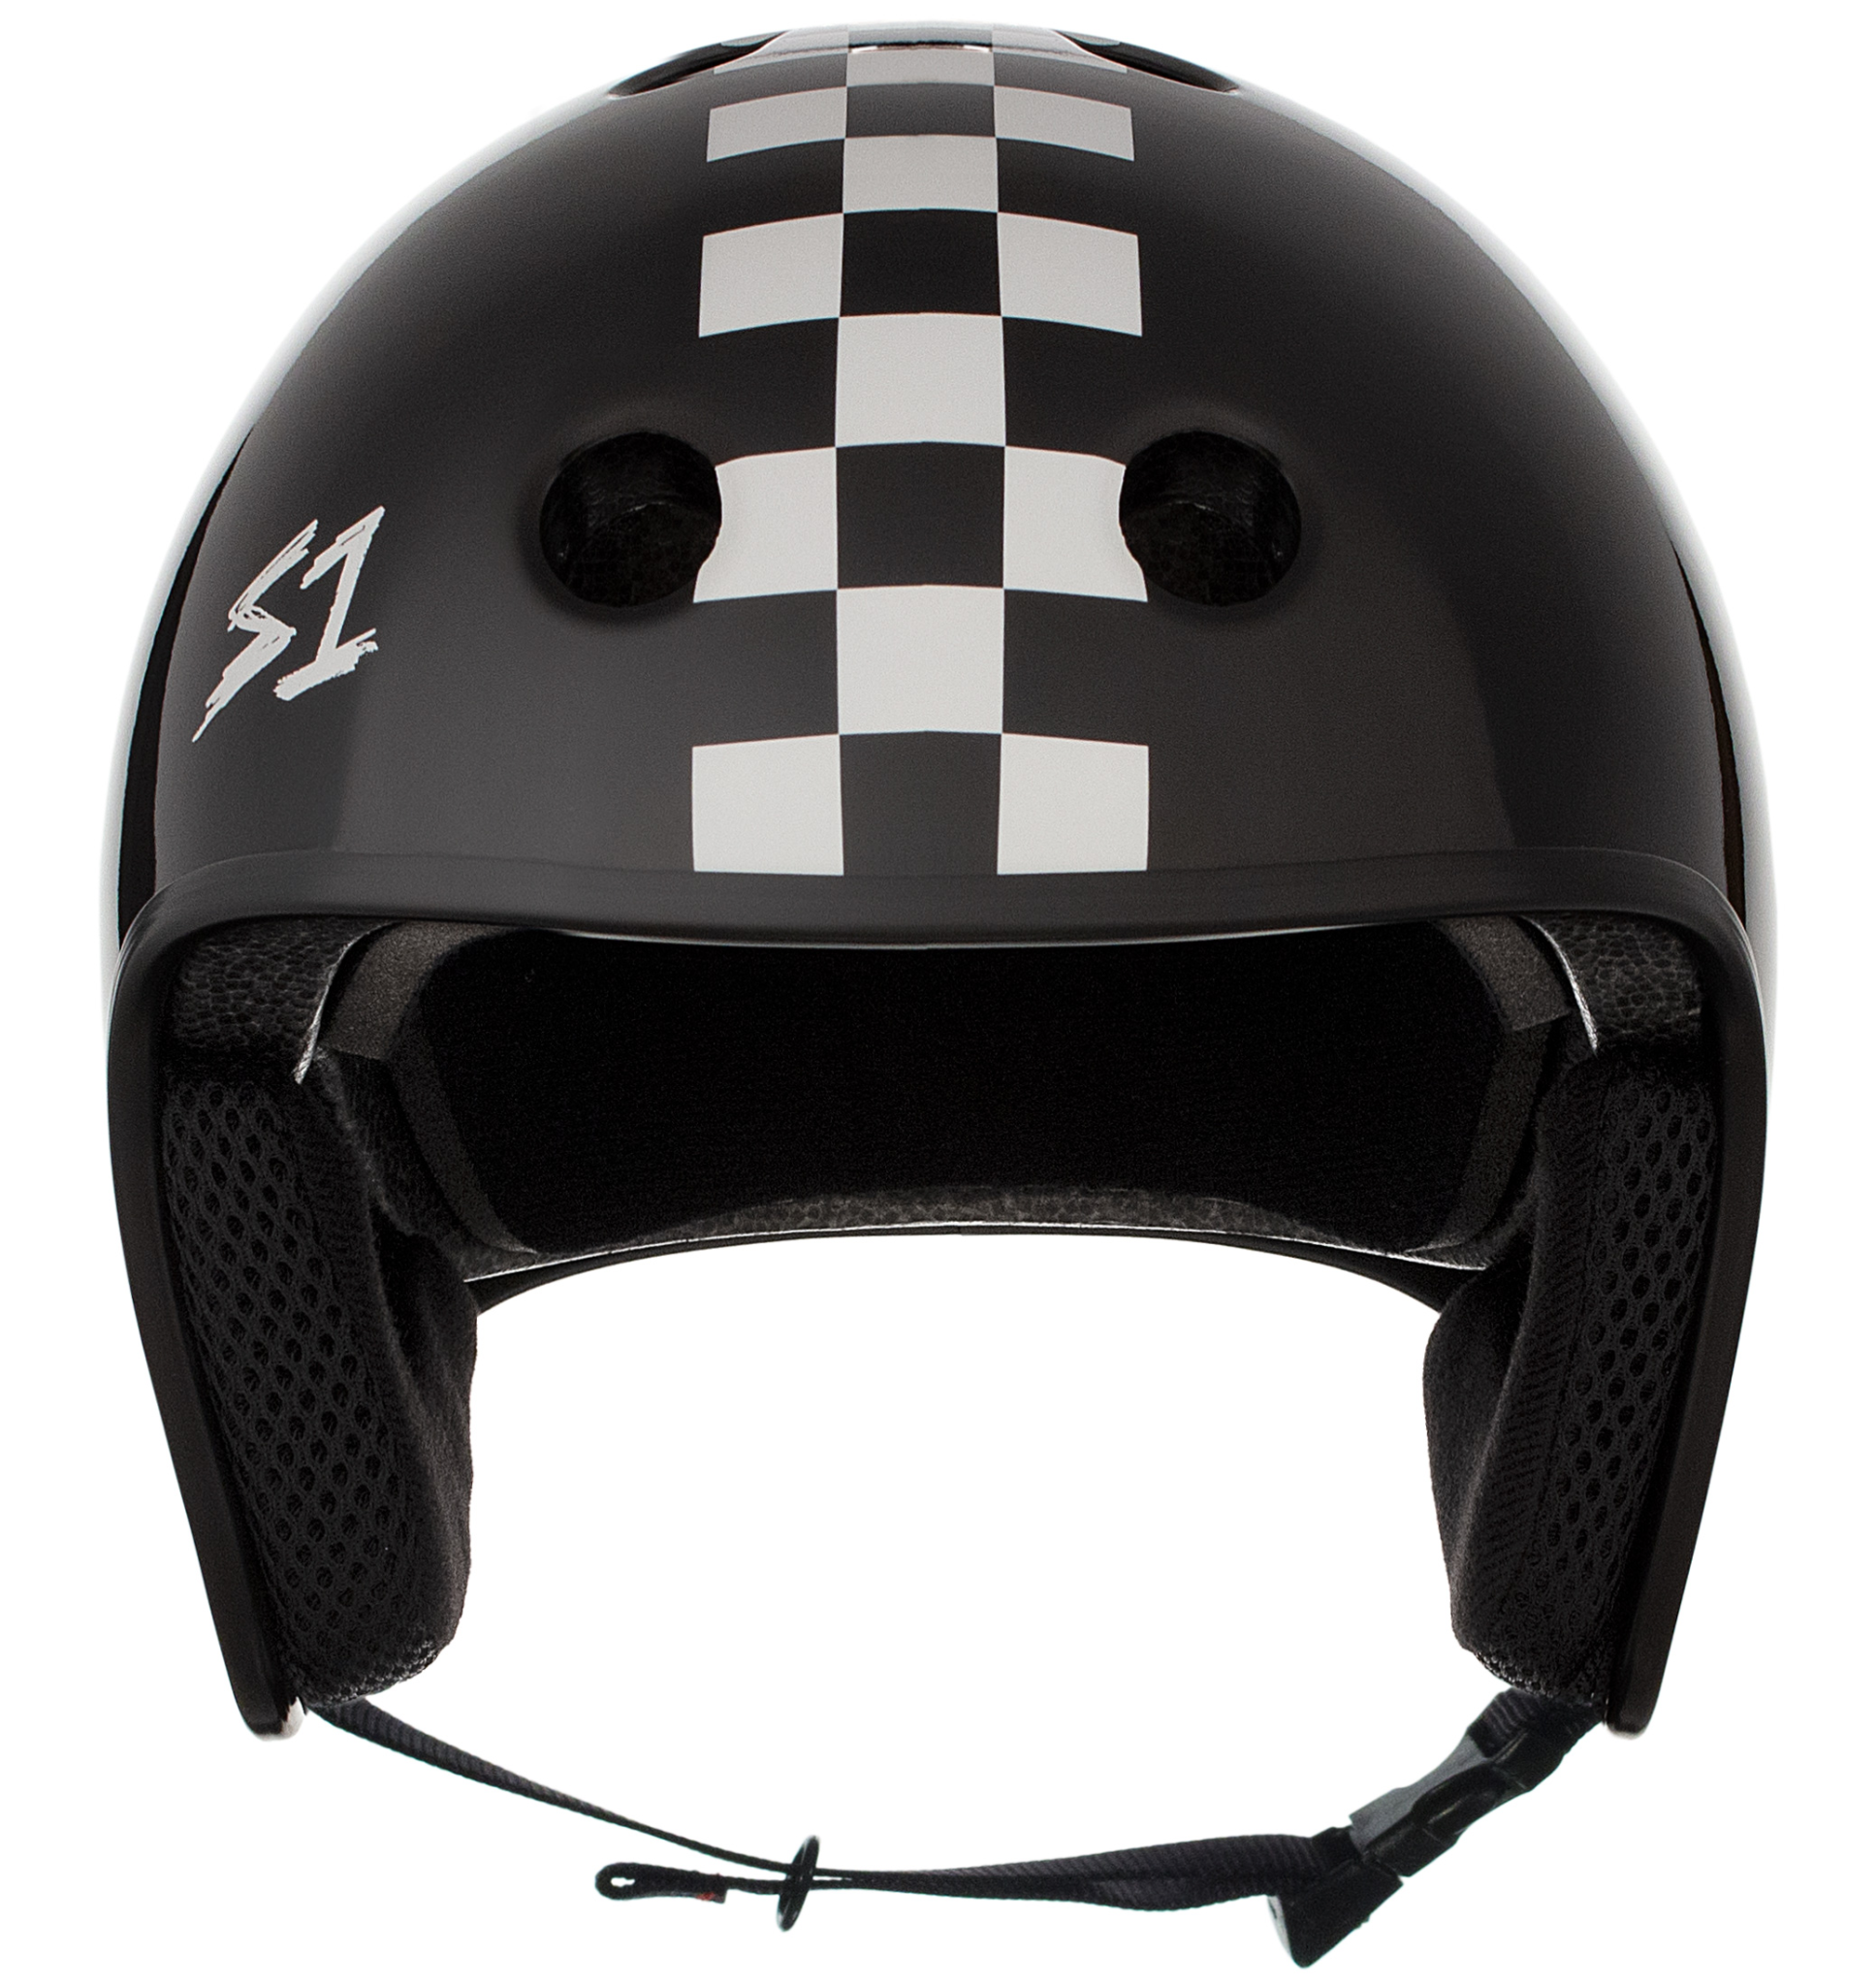 S-1 Retro Lifer Helmet - Black Gloss w/ White Checkers